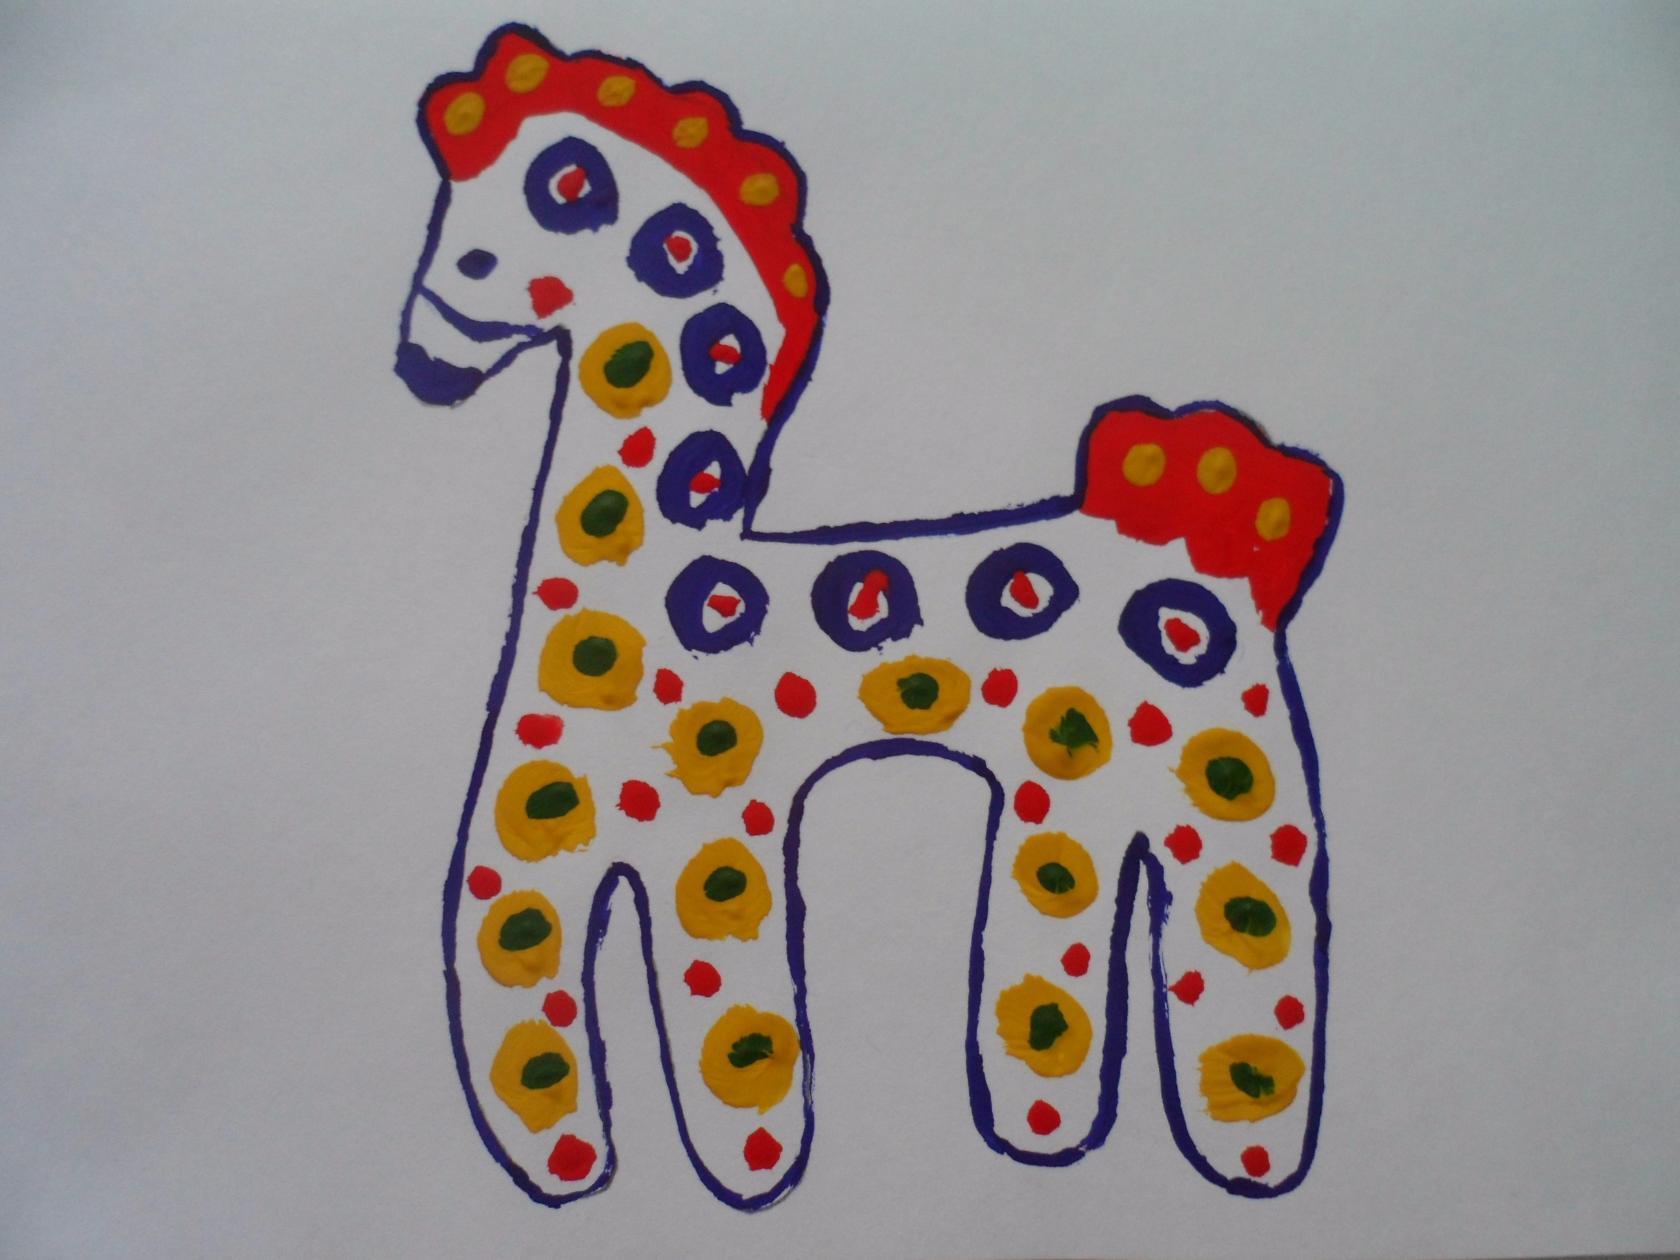 Певцу картинки, картинки дымковской игрушки лошадки